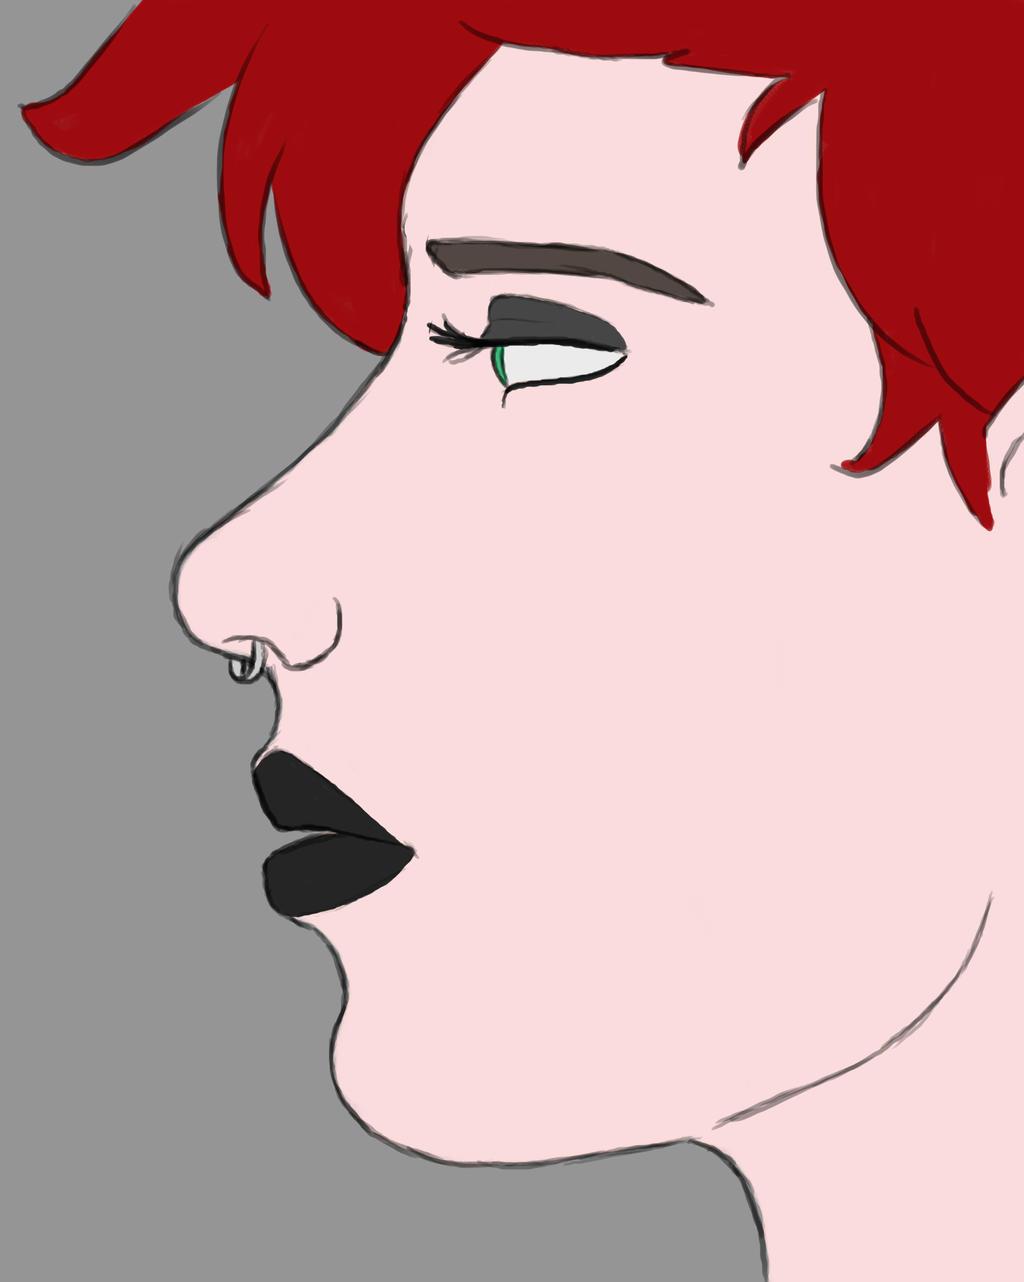 RedHead Daily sketch #764 by GothicVampireFreak